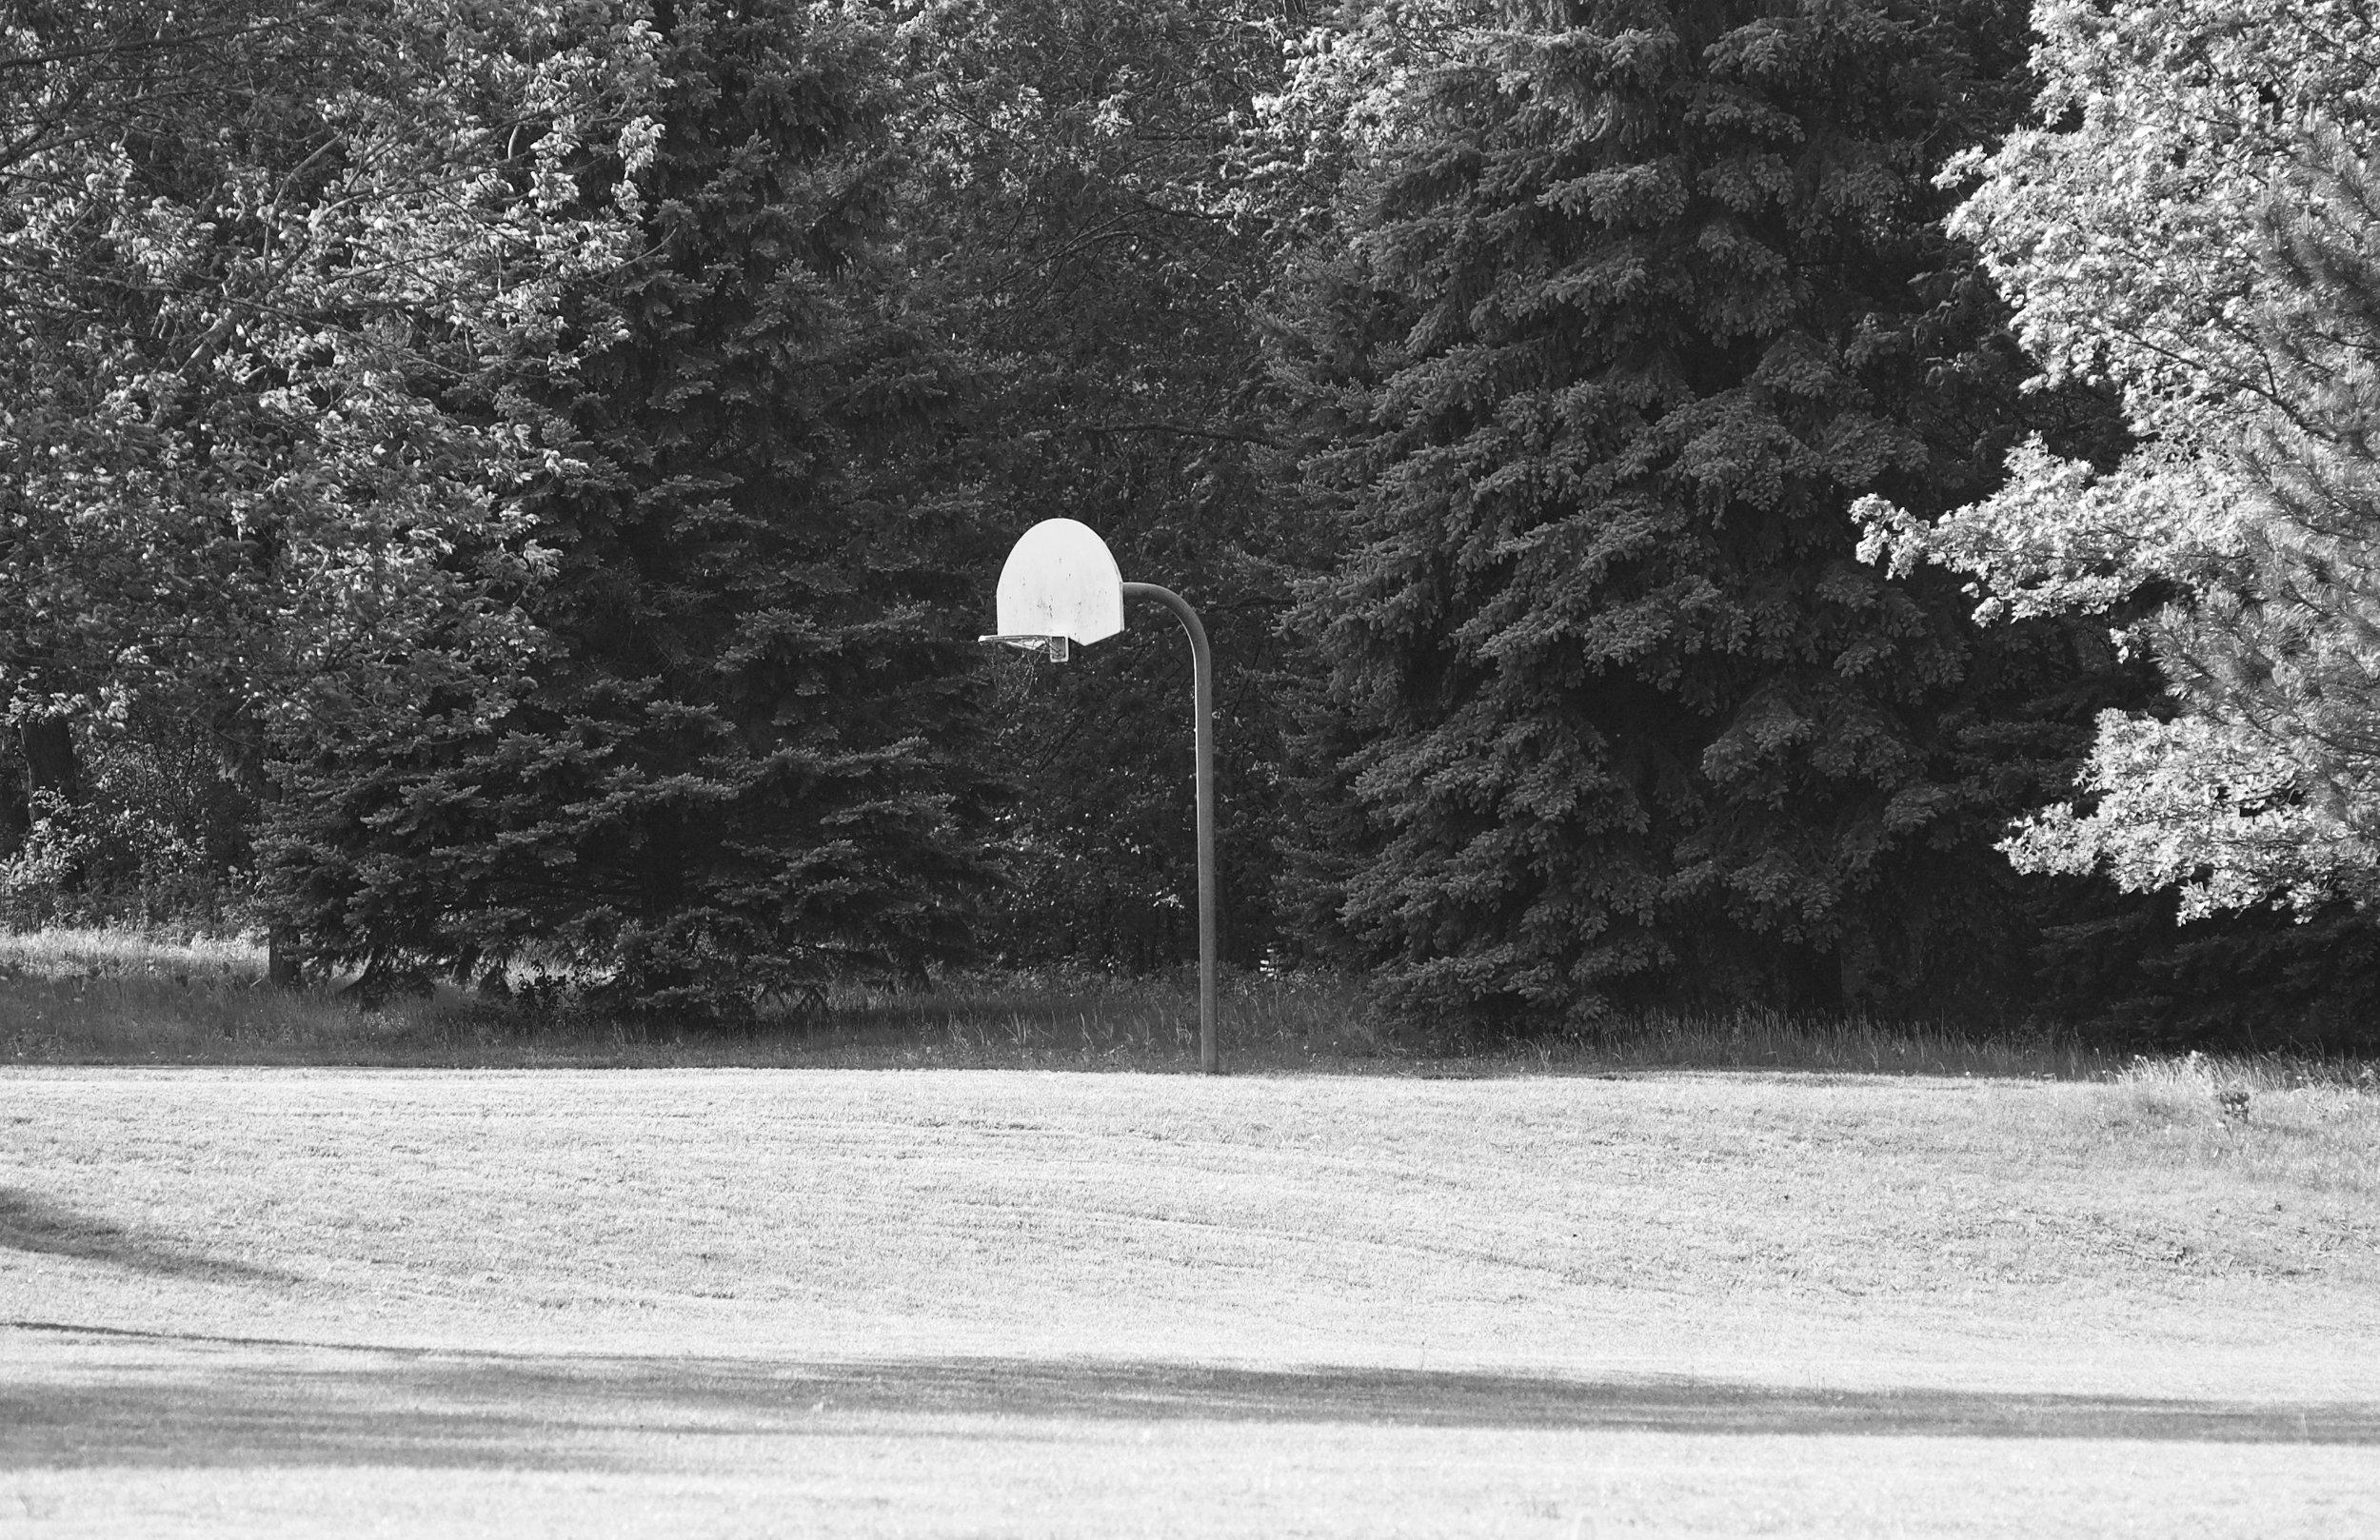 No Net. Woodland Hills Park. Madison, Wisconsin. May 2017. © William D. Walker